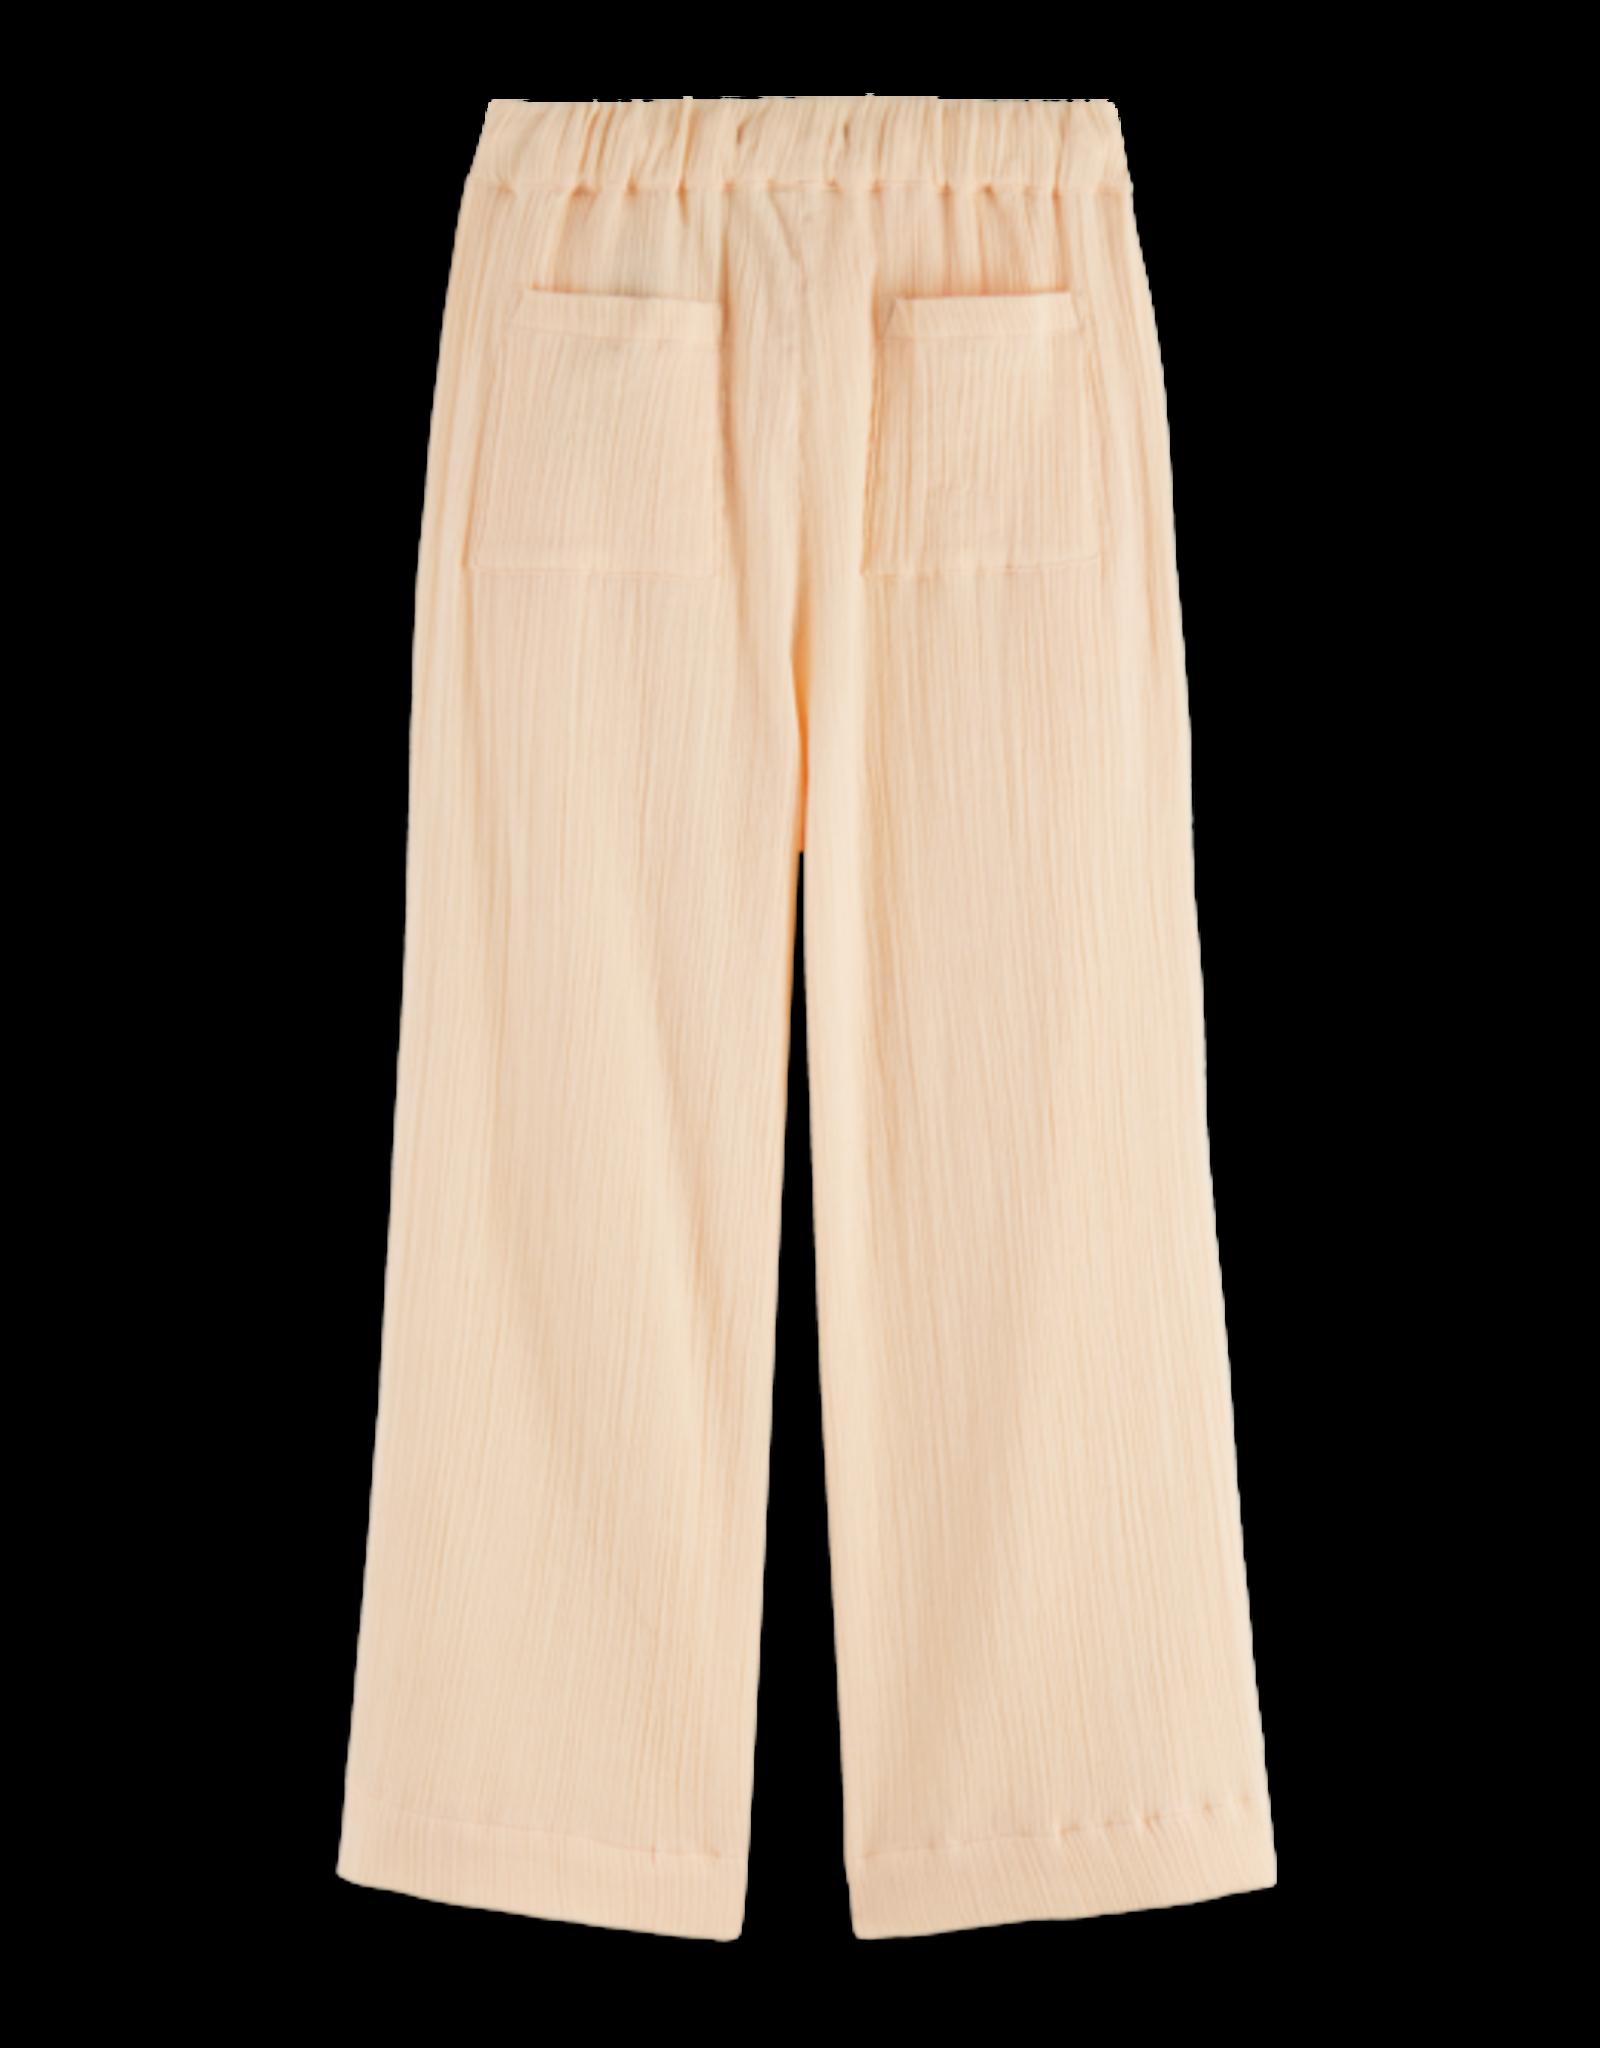 Scotch&Soda Scotch&Soda SS21 161237 Cotton cropped loose fit pants